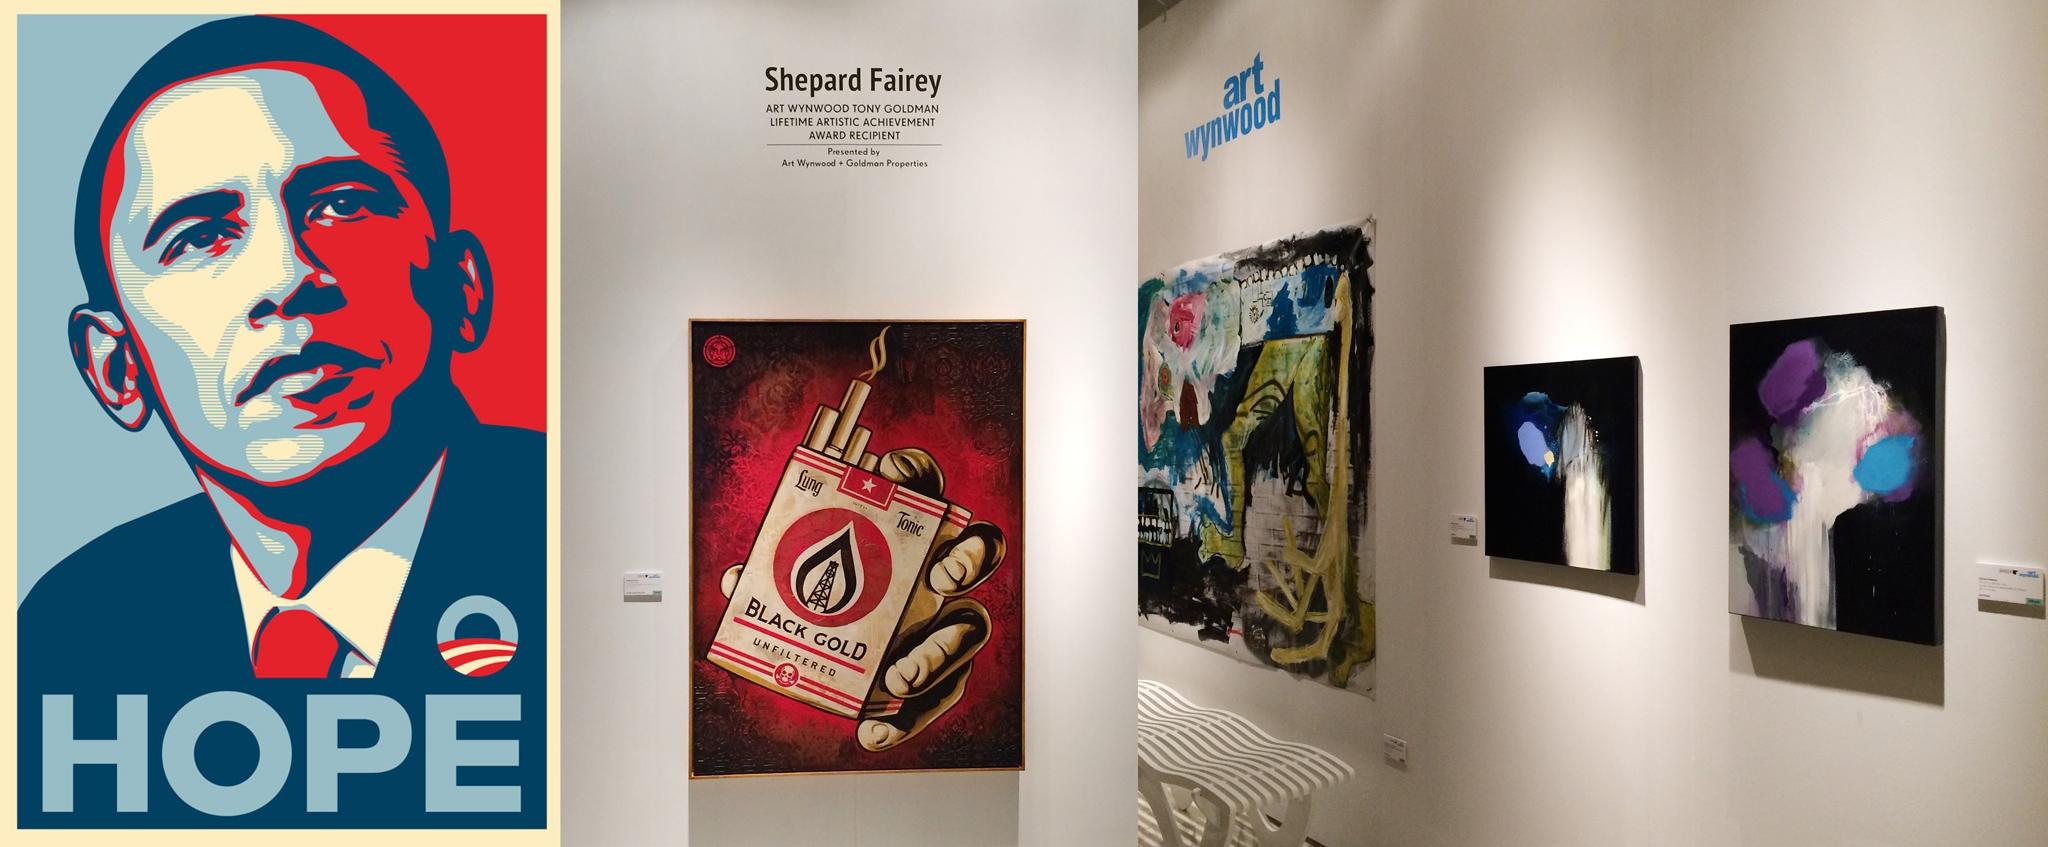 En bonne compagnie avec Shephard Fairey (Obey Giant) & David Ramirez Gomez